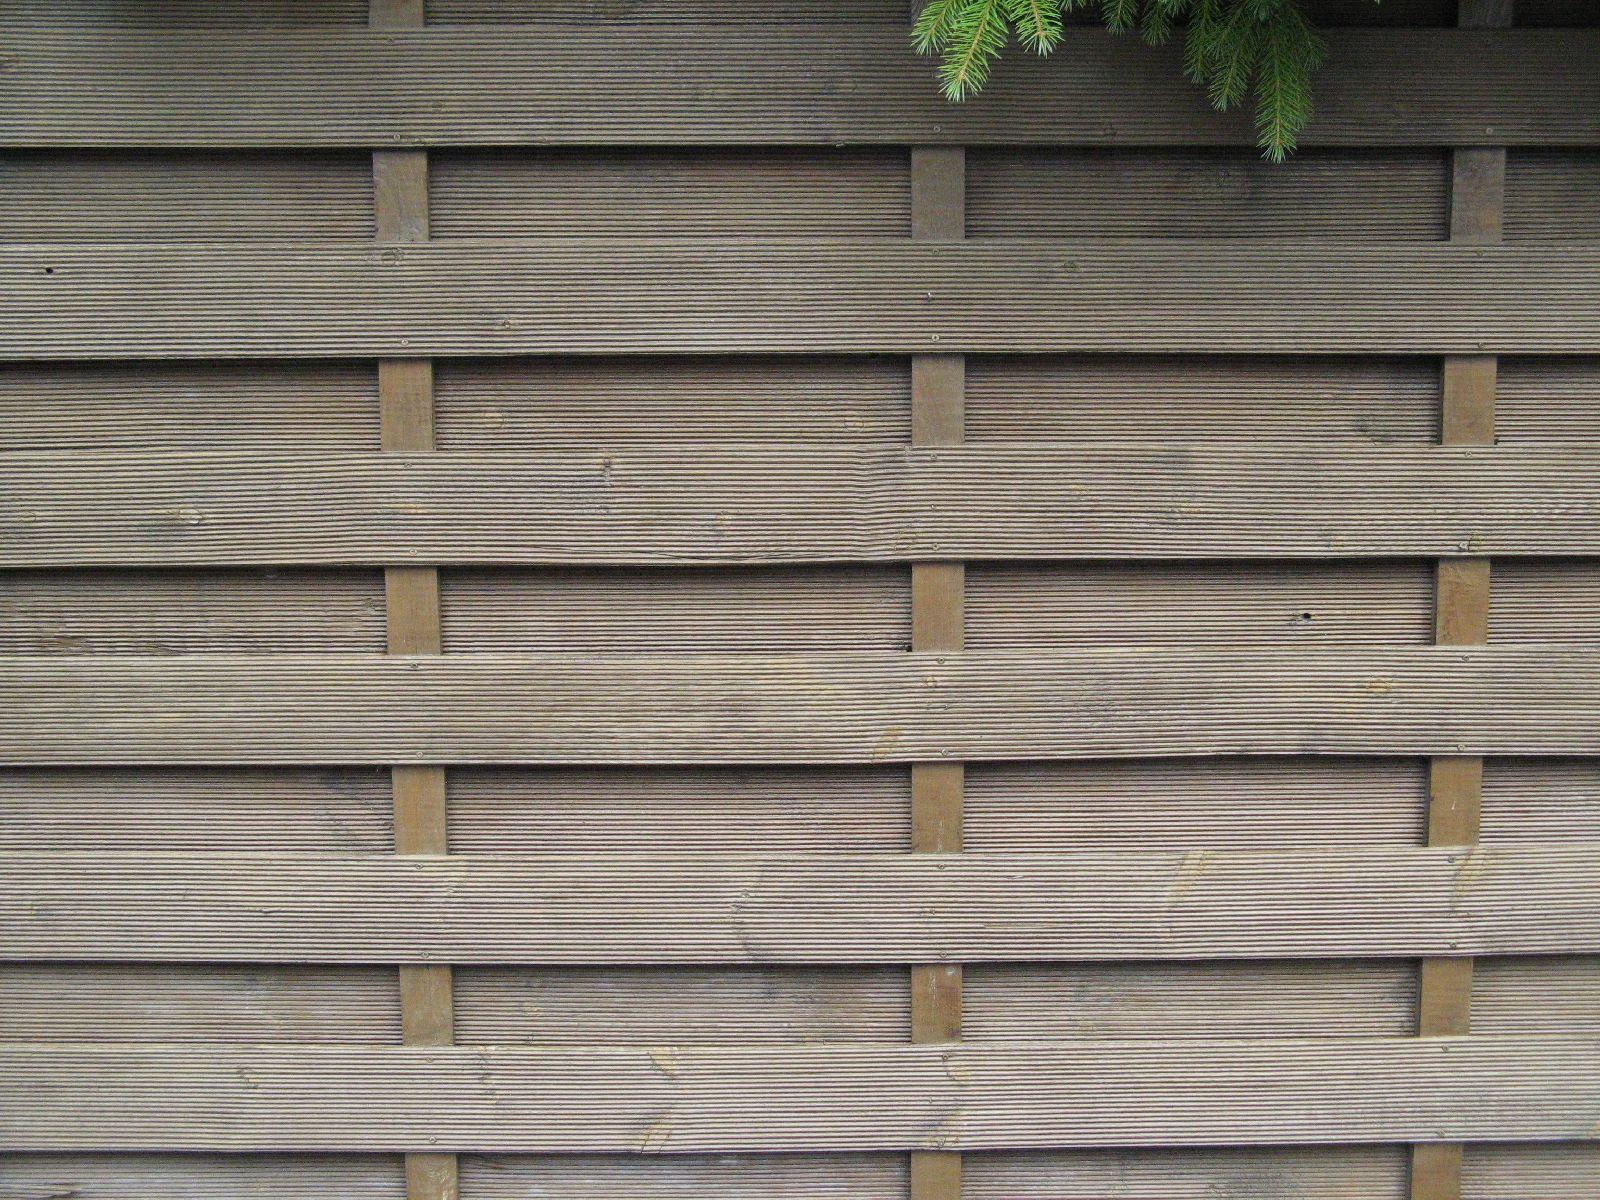 Wood_Textures_B_1148